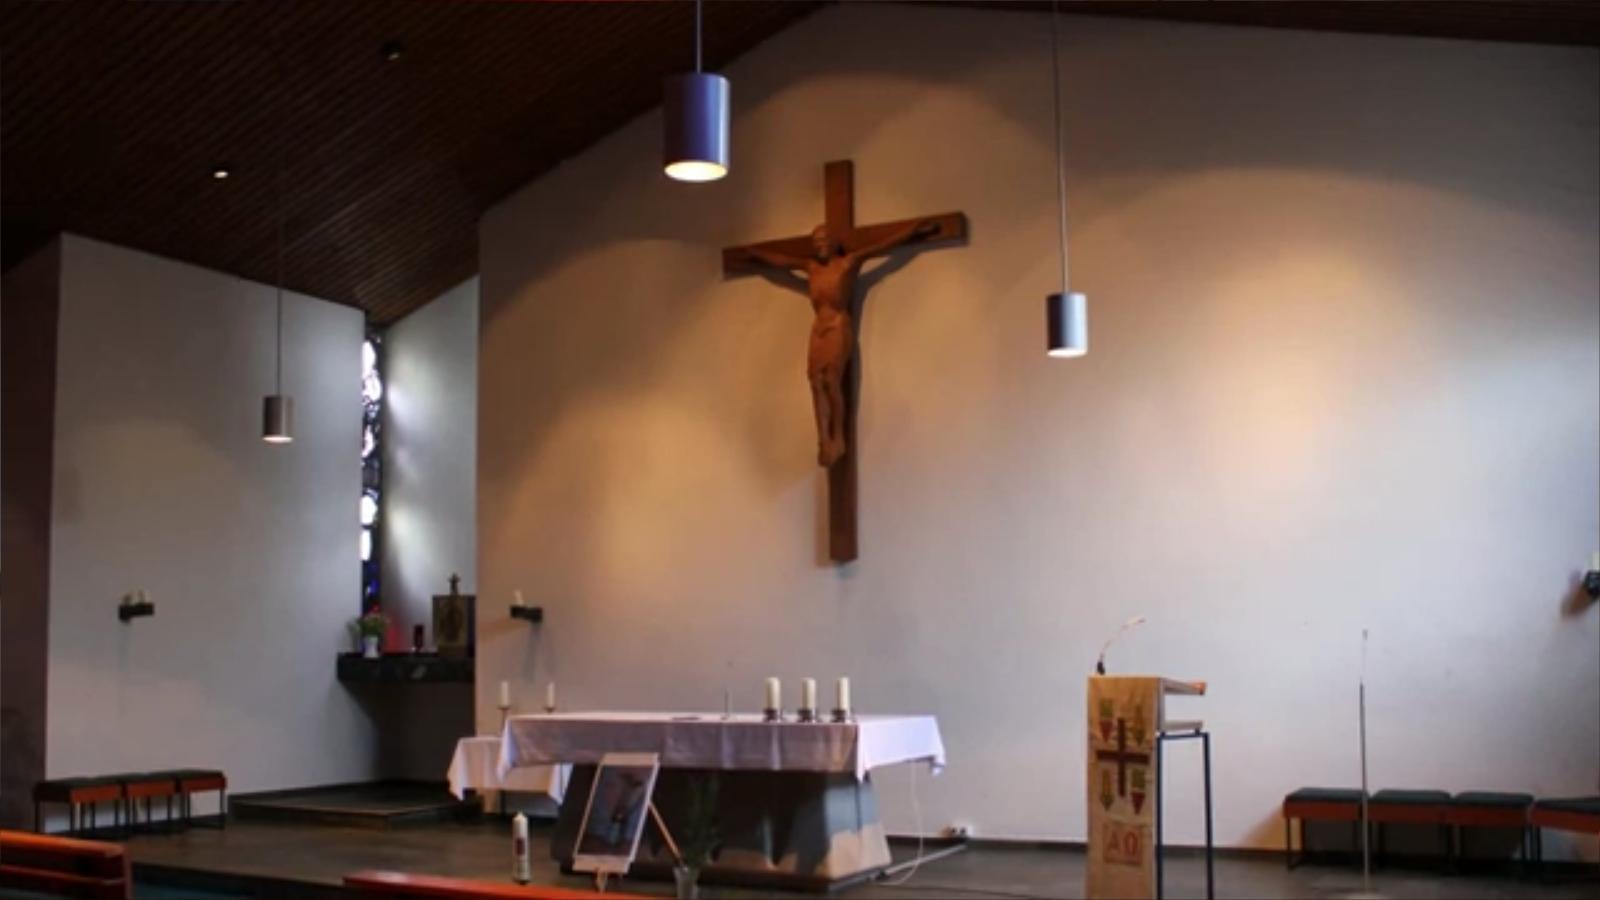 Schönberg, St. Ansgar (Bild: youtube-Still, WojtekTenambergen, 2012)